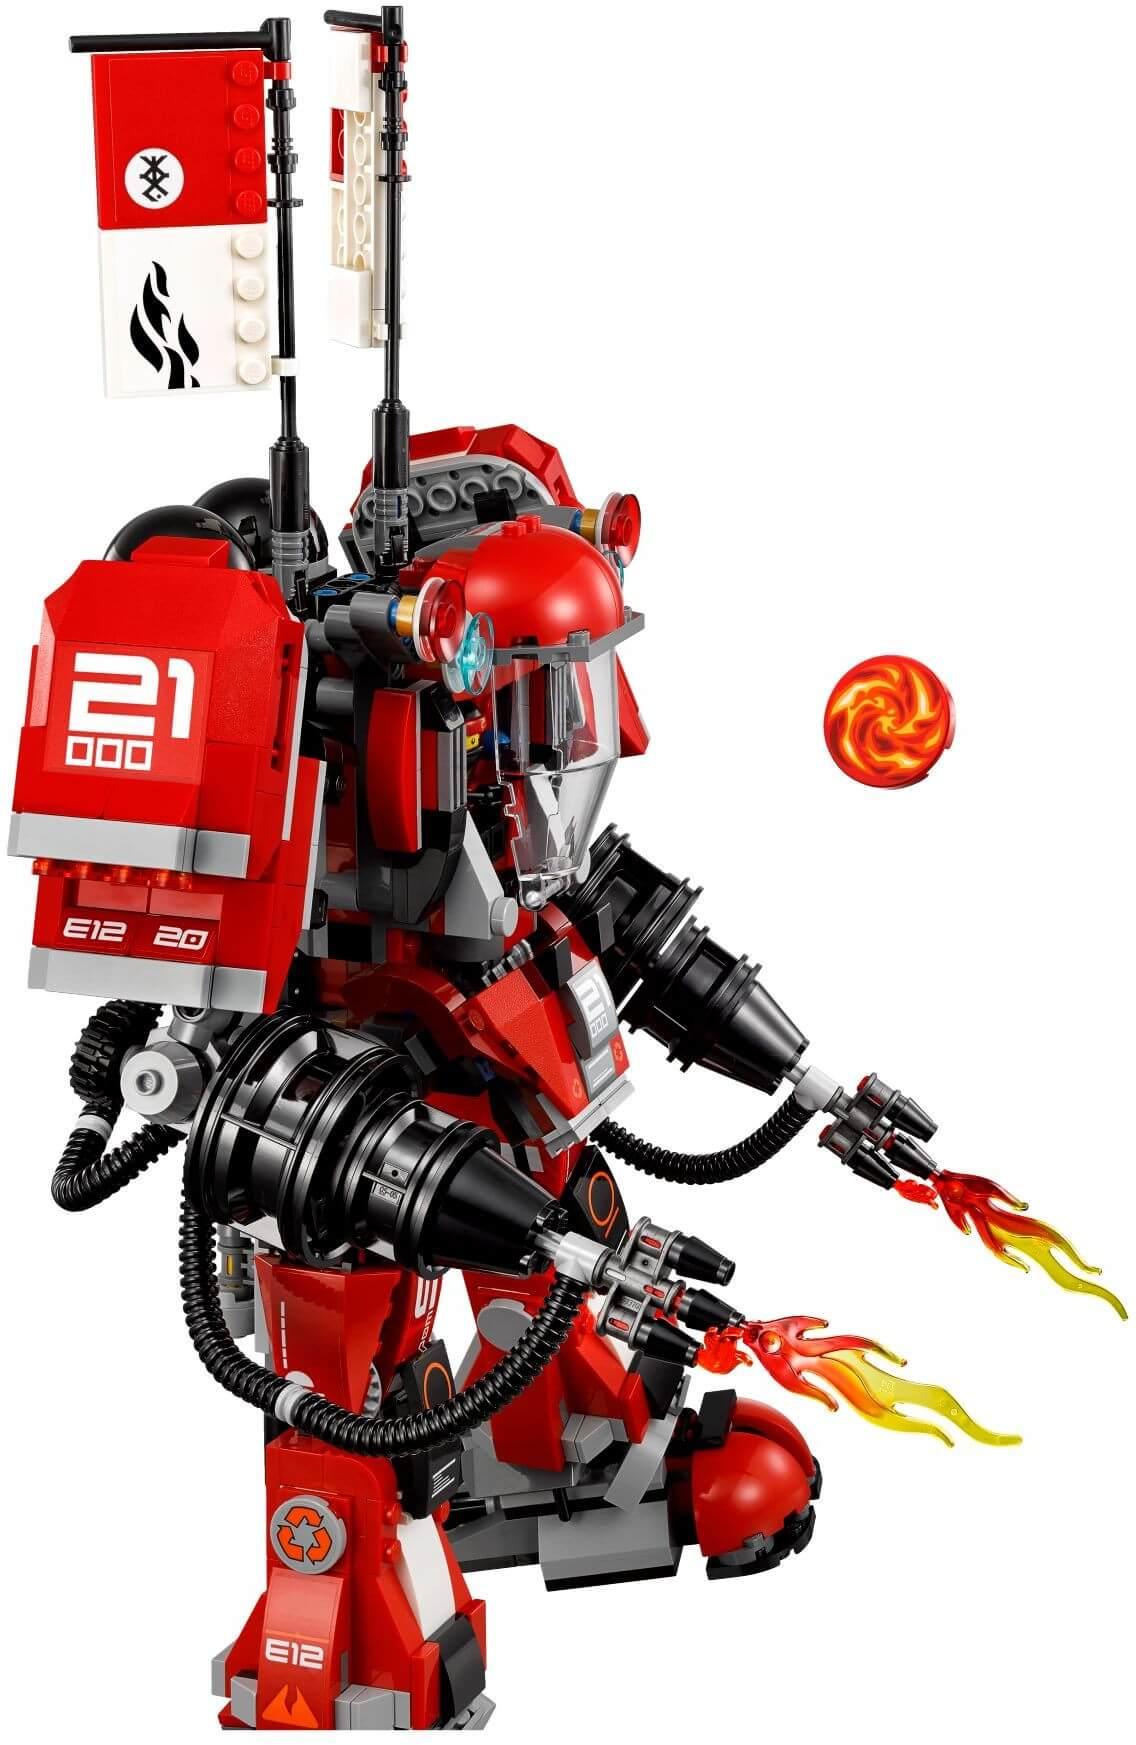 Mua đồ chơi LEGO 70615 - LEGO Ninjago 70615 - Người Máy Samurai Lửa Khổng Lồ của Kai (LEGO Ninjago Fire Mech)